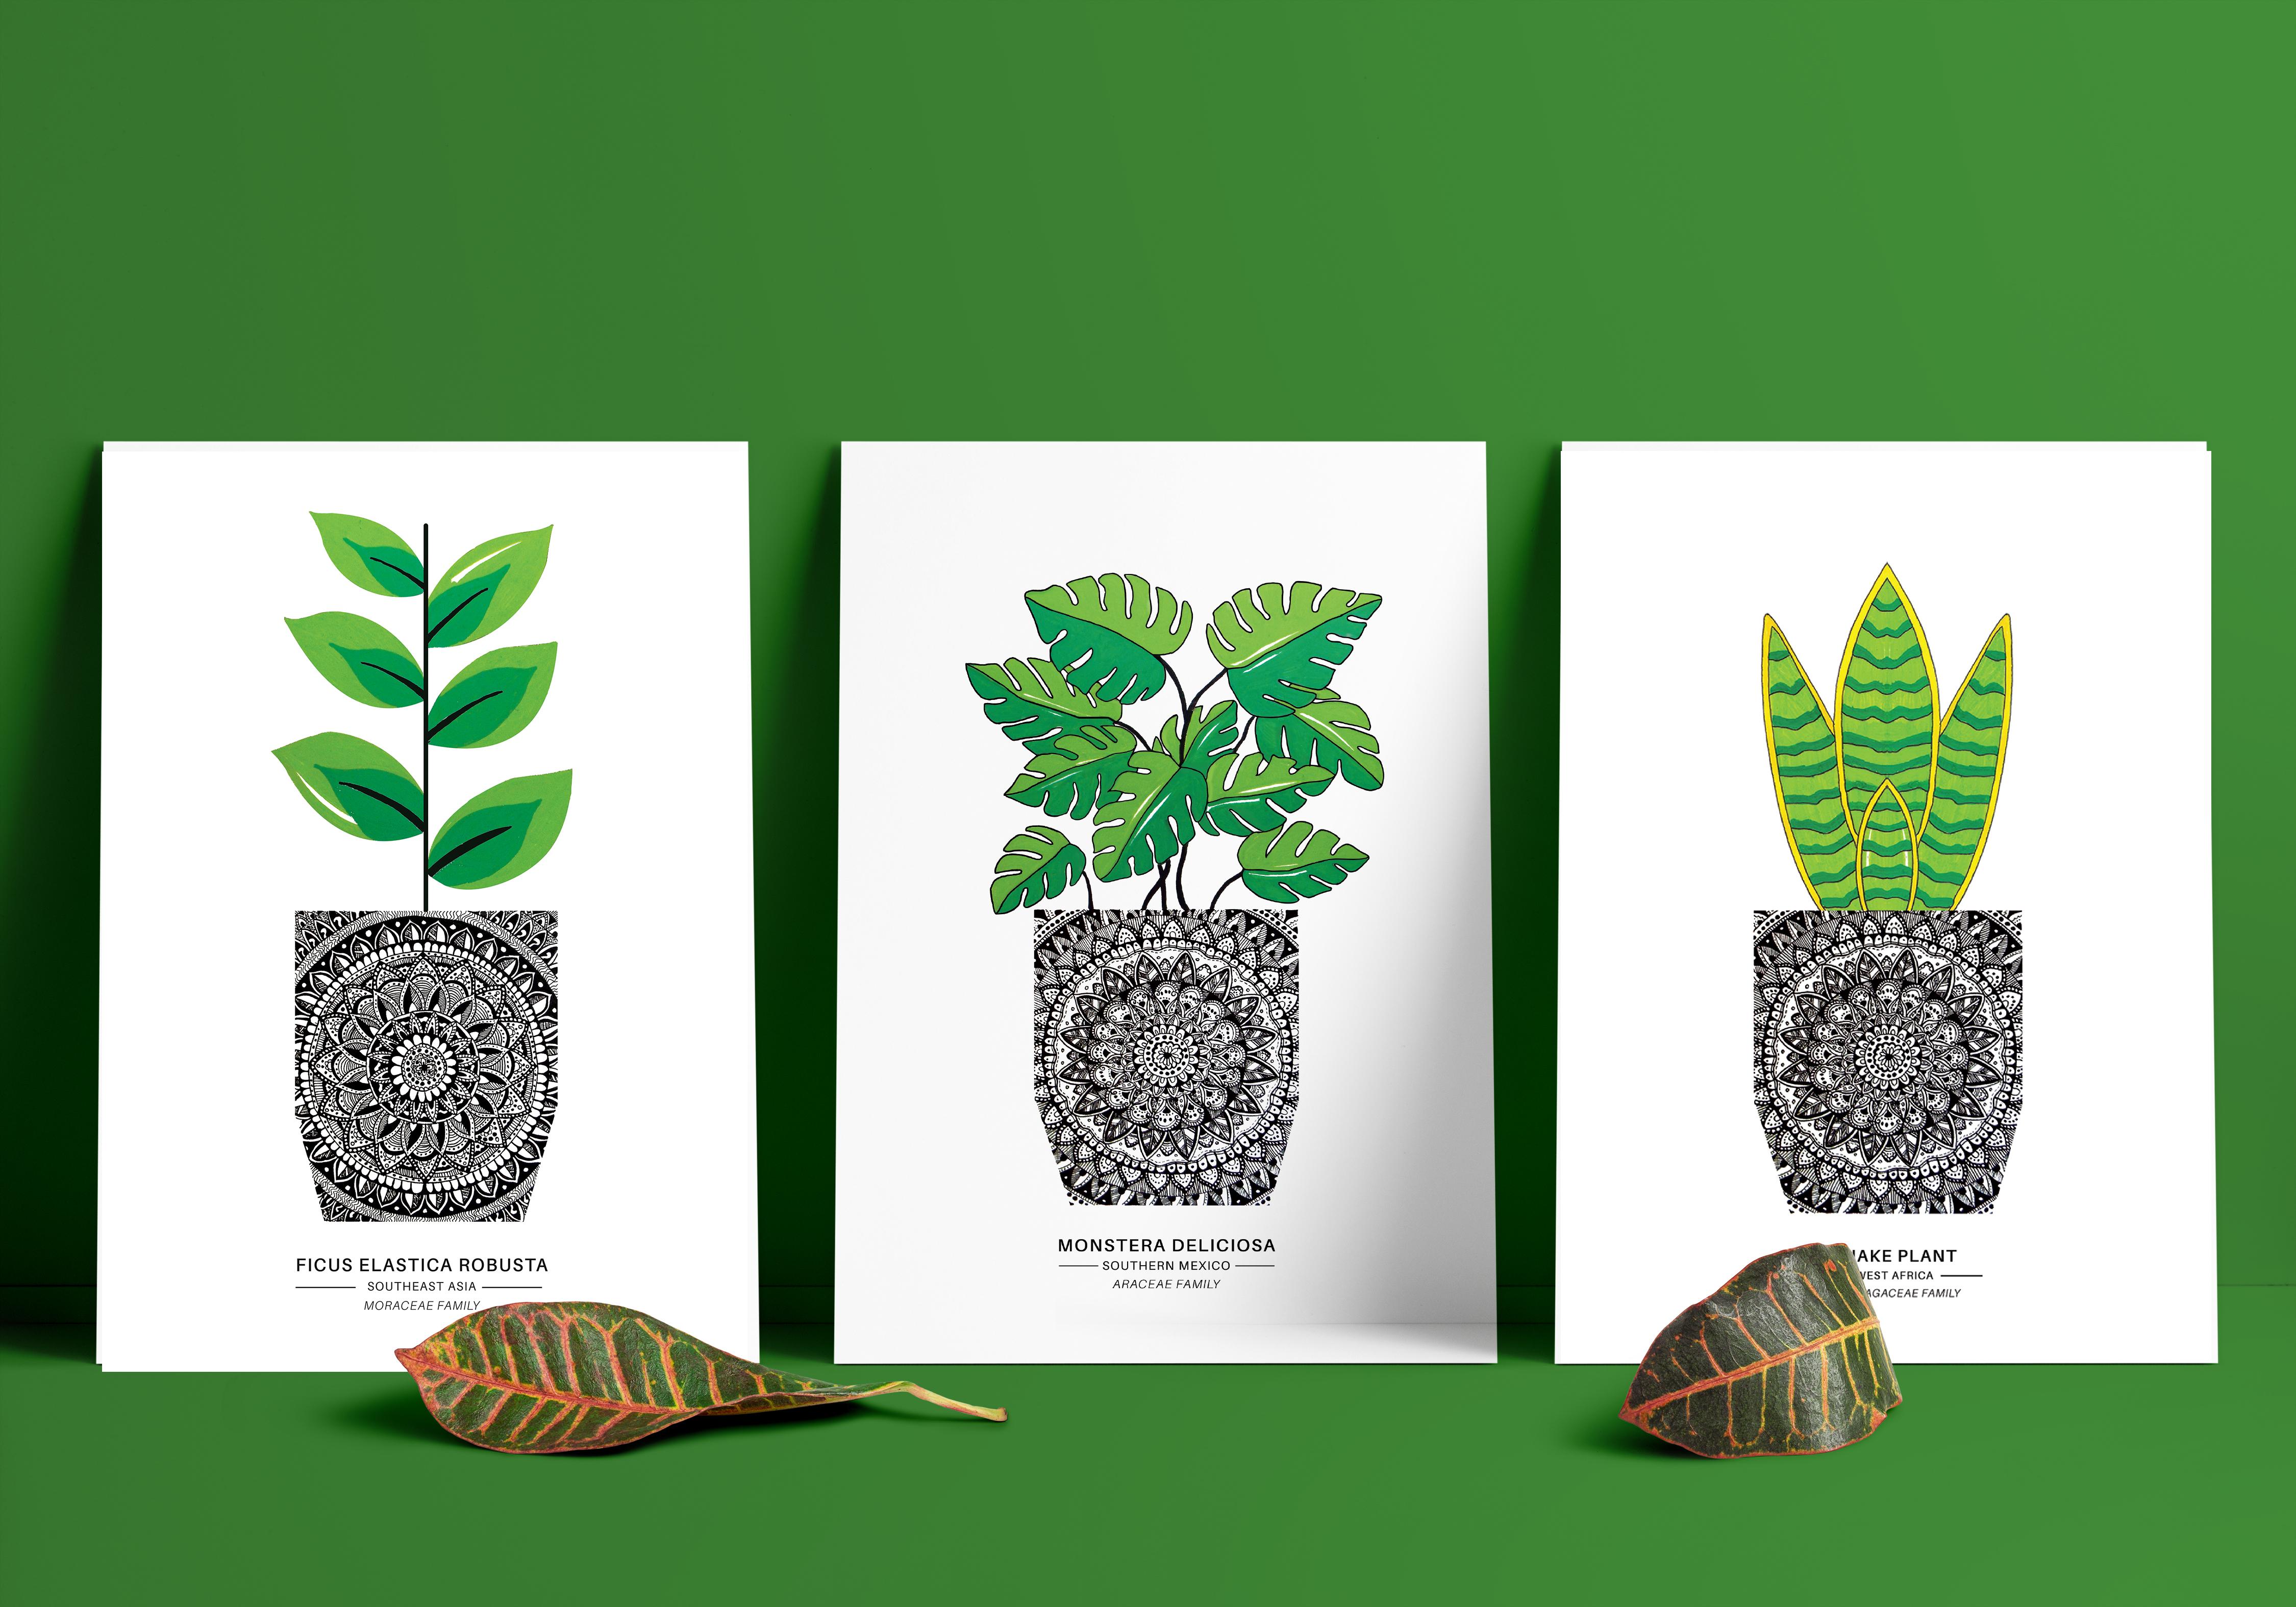 Three plants imposed